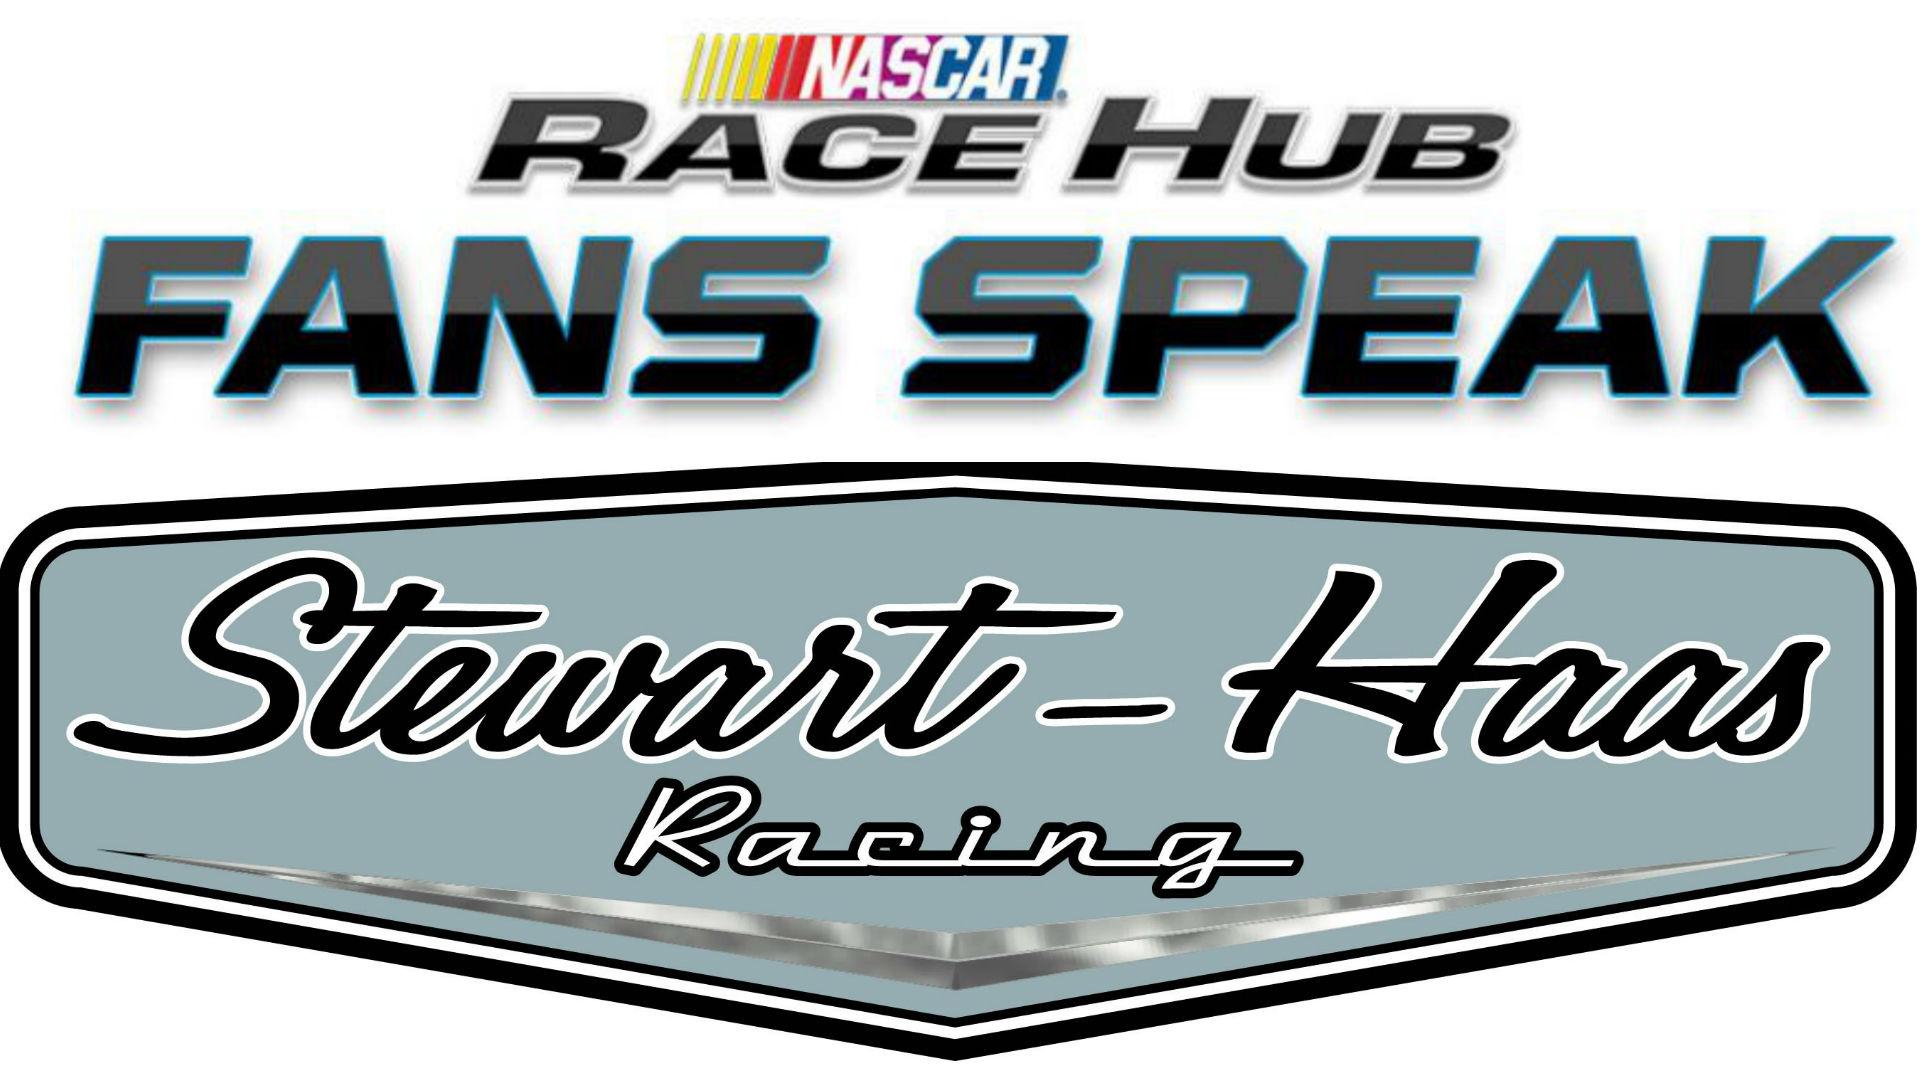 NASCAR-SHR-061415-FTR-Getty.jpg